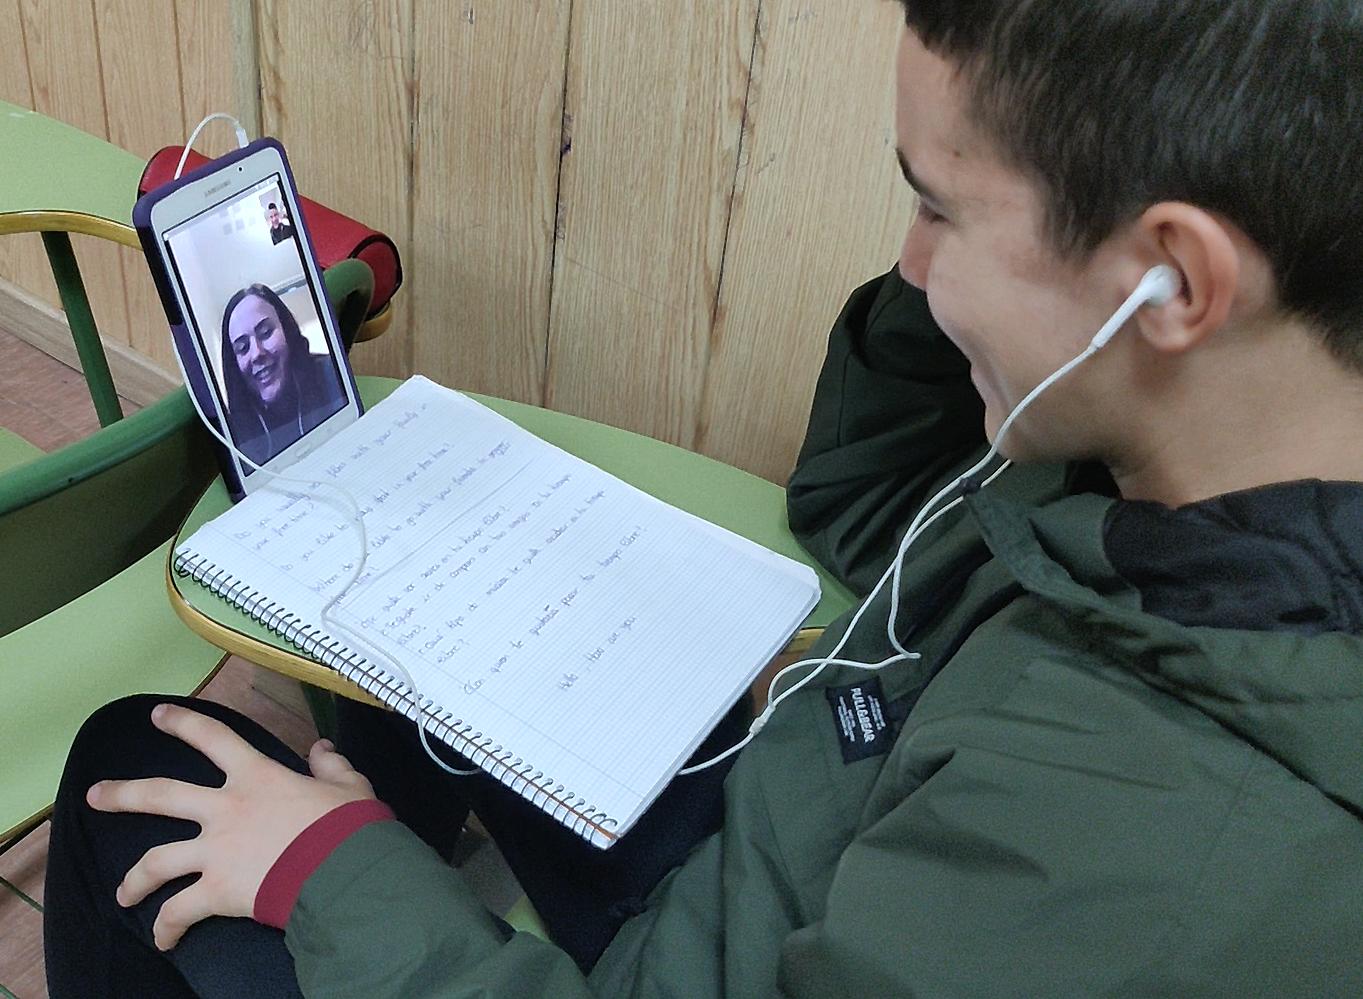 Spanish student videochatting his Norwegian partner student at his school in Málaga, Spain